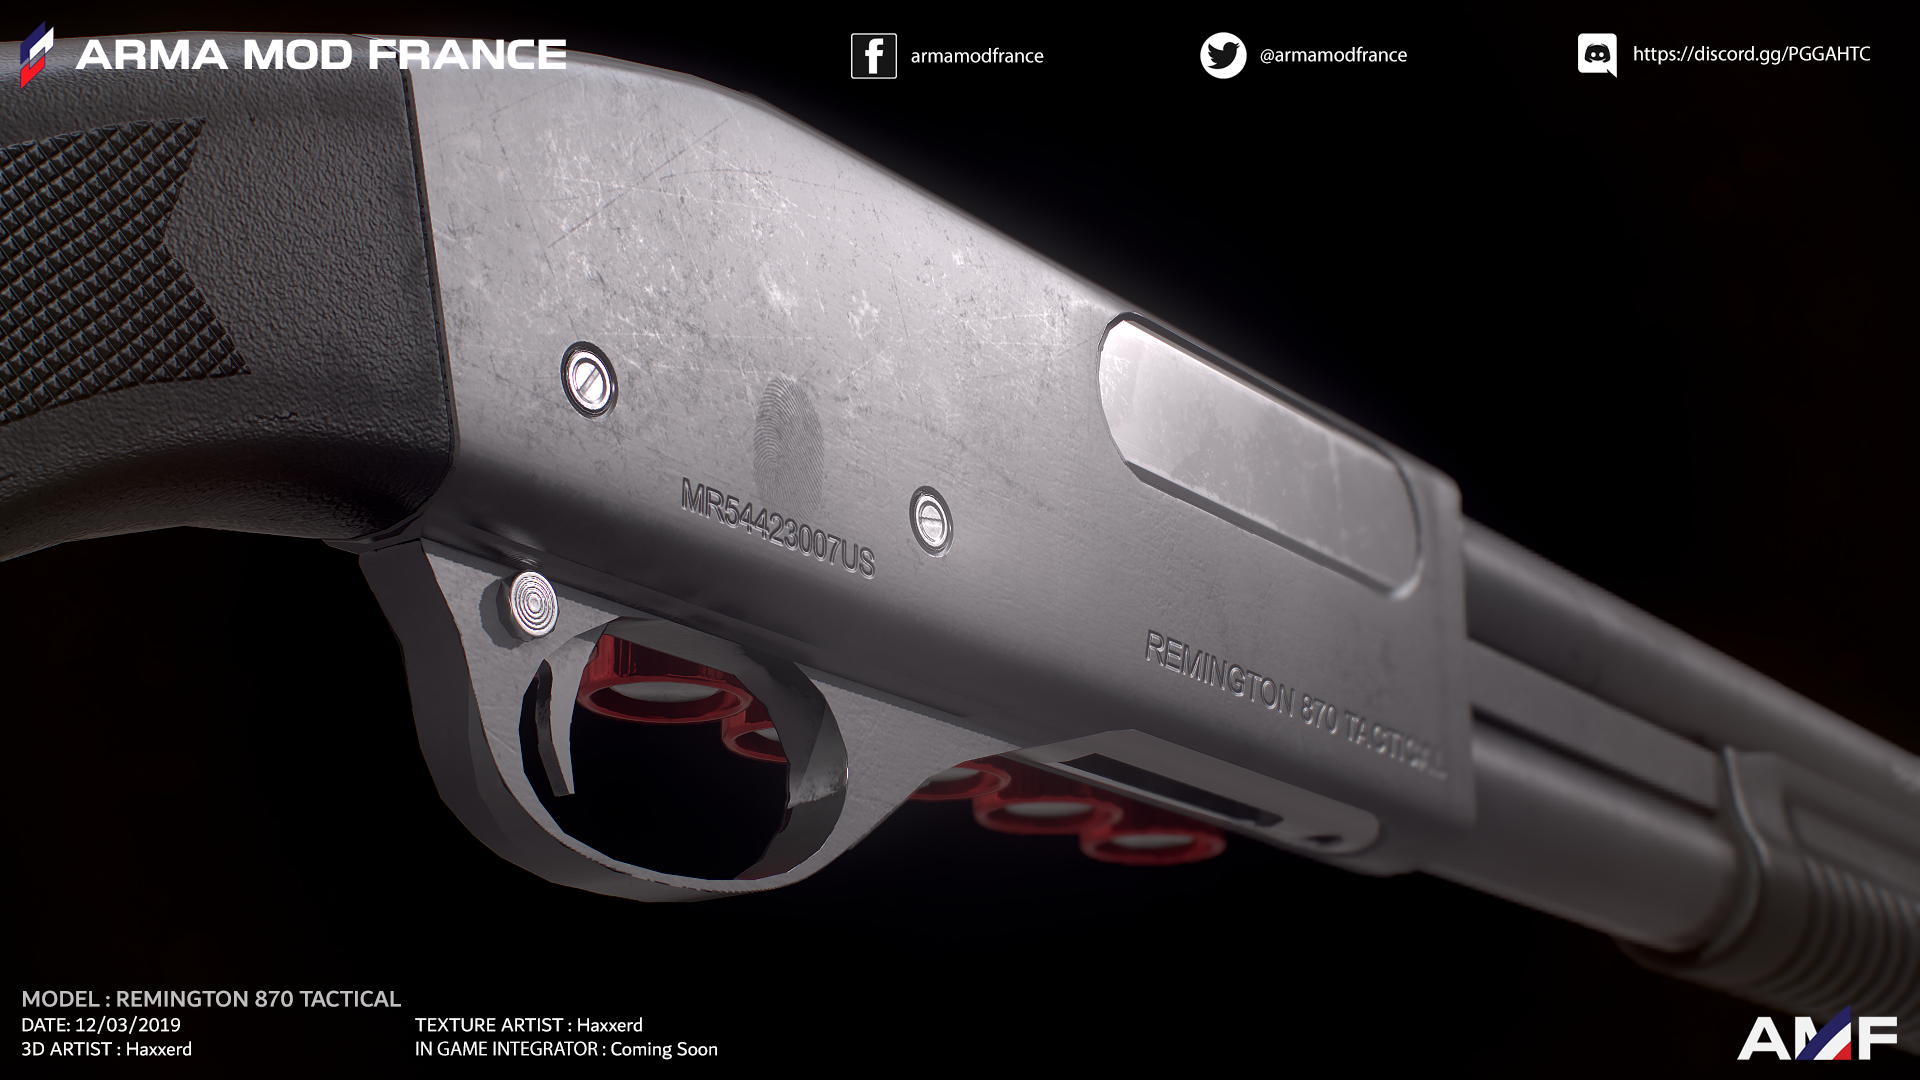 remington870Tactical03.png